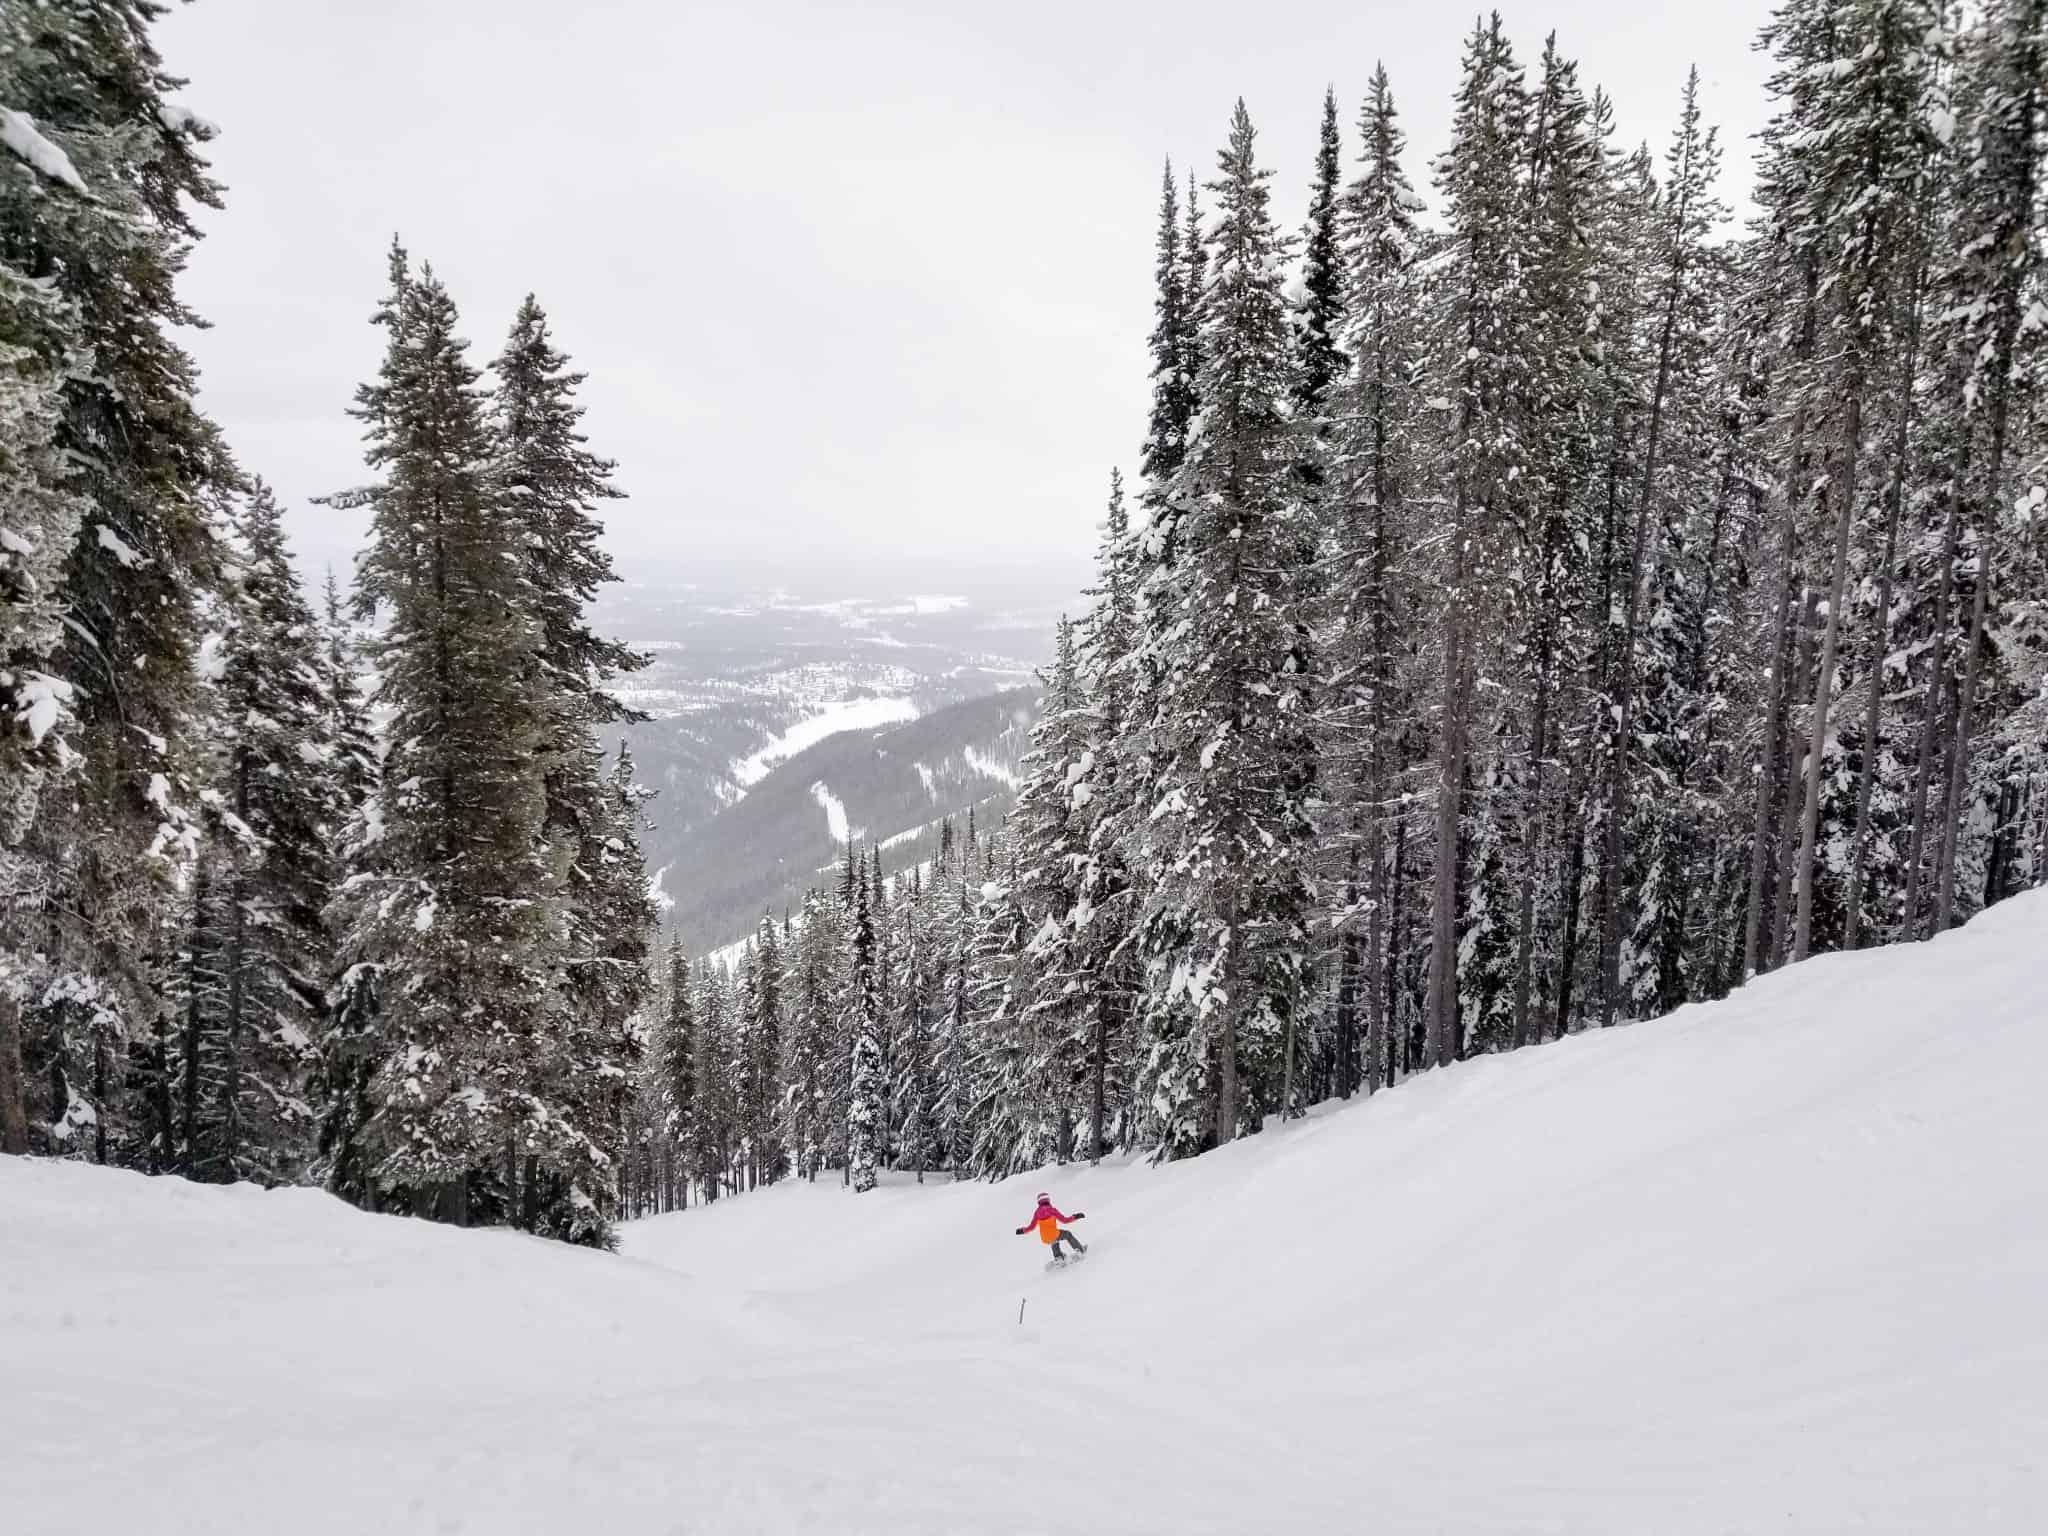 Station de ski Kimberley - Stations de ski canadiennes